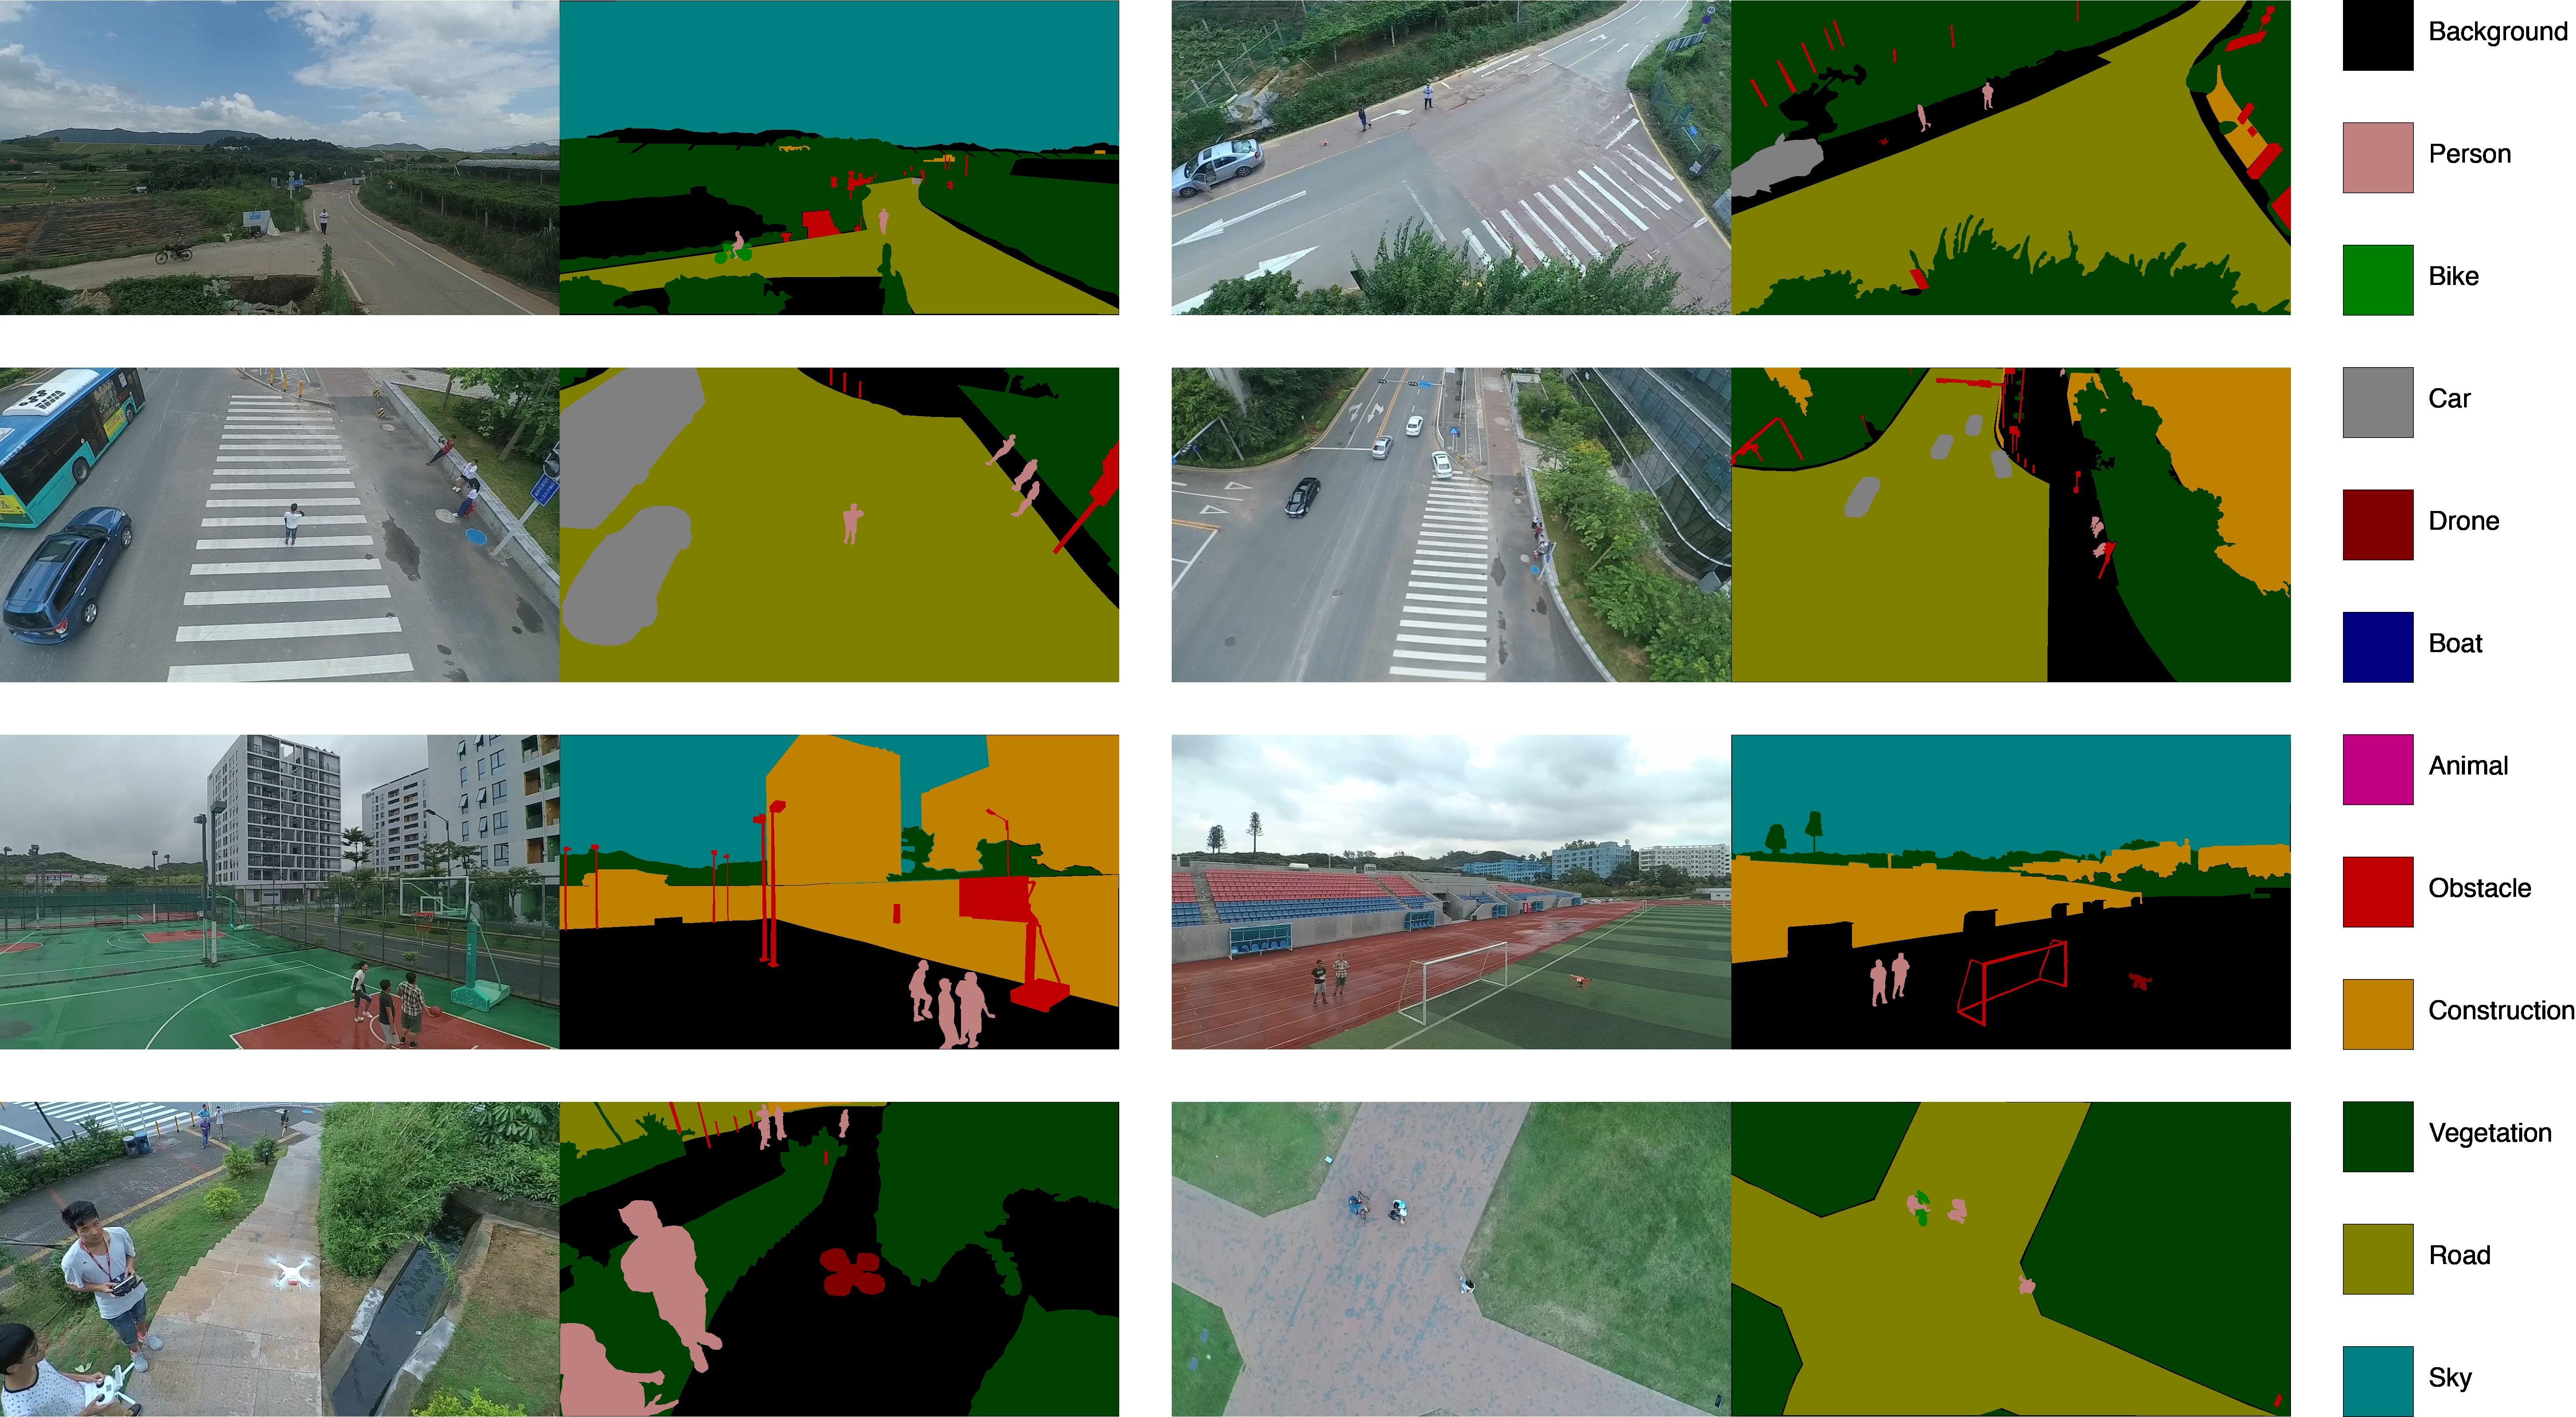 aeroscapes_dataset_sample_images